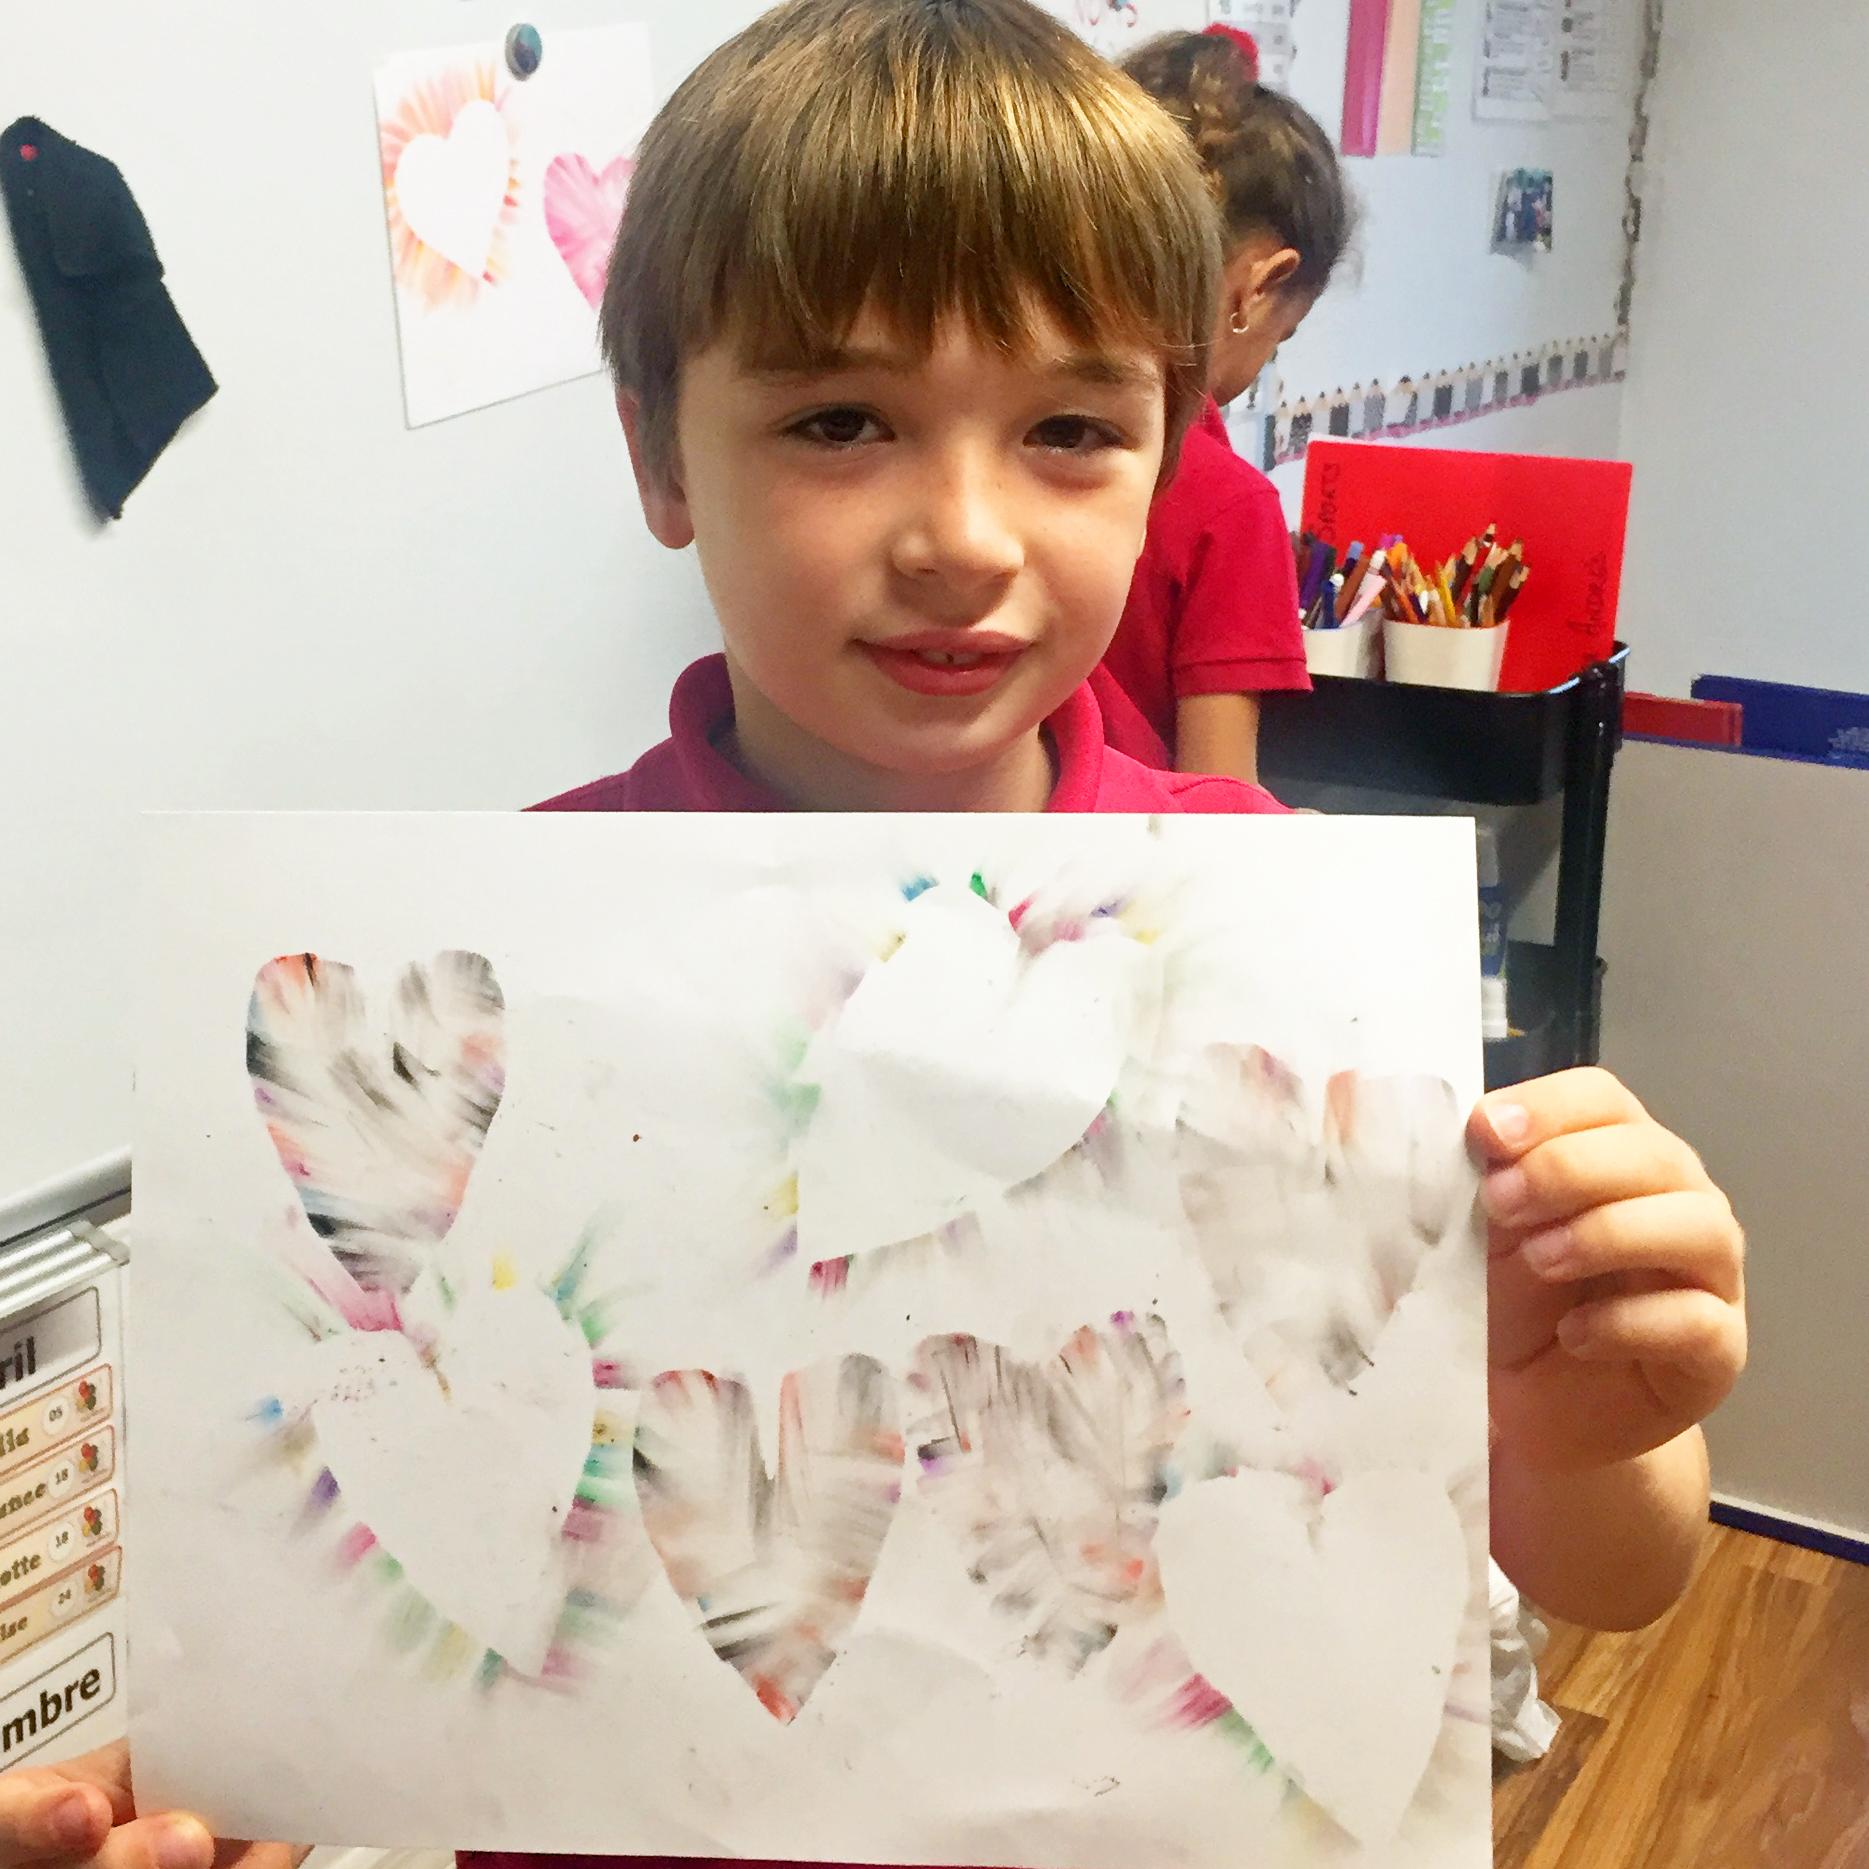 french-school-miami-kindergarten-art-program.JPG